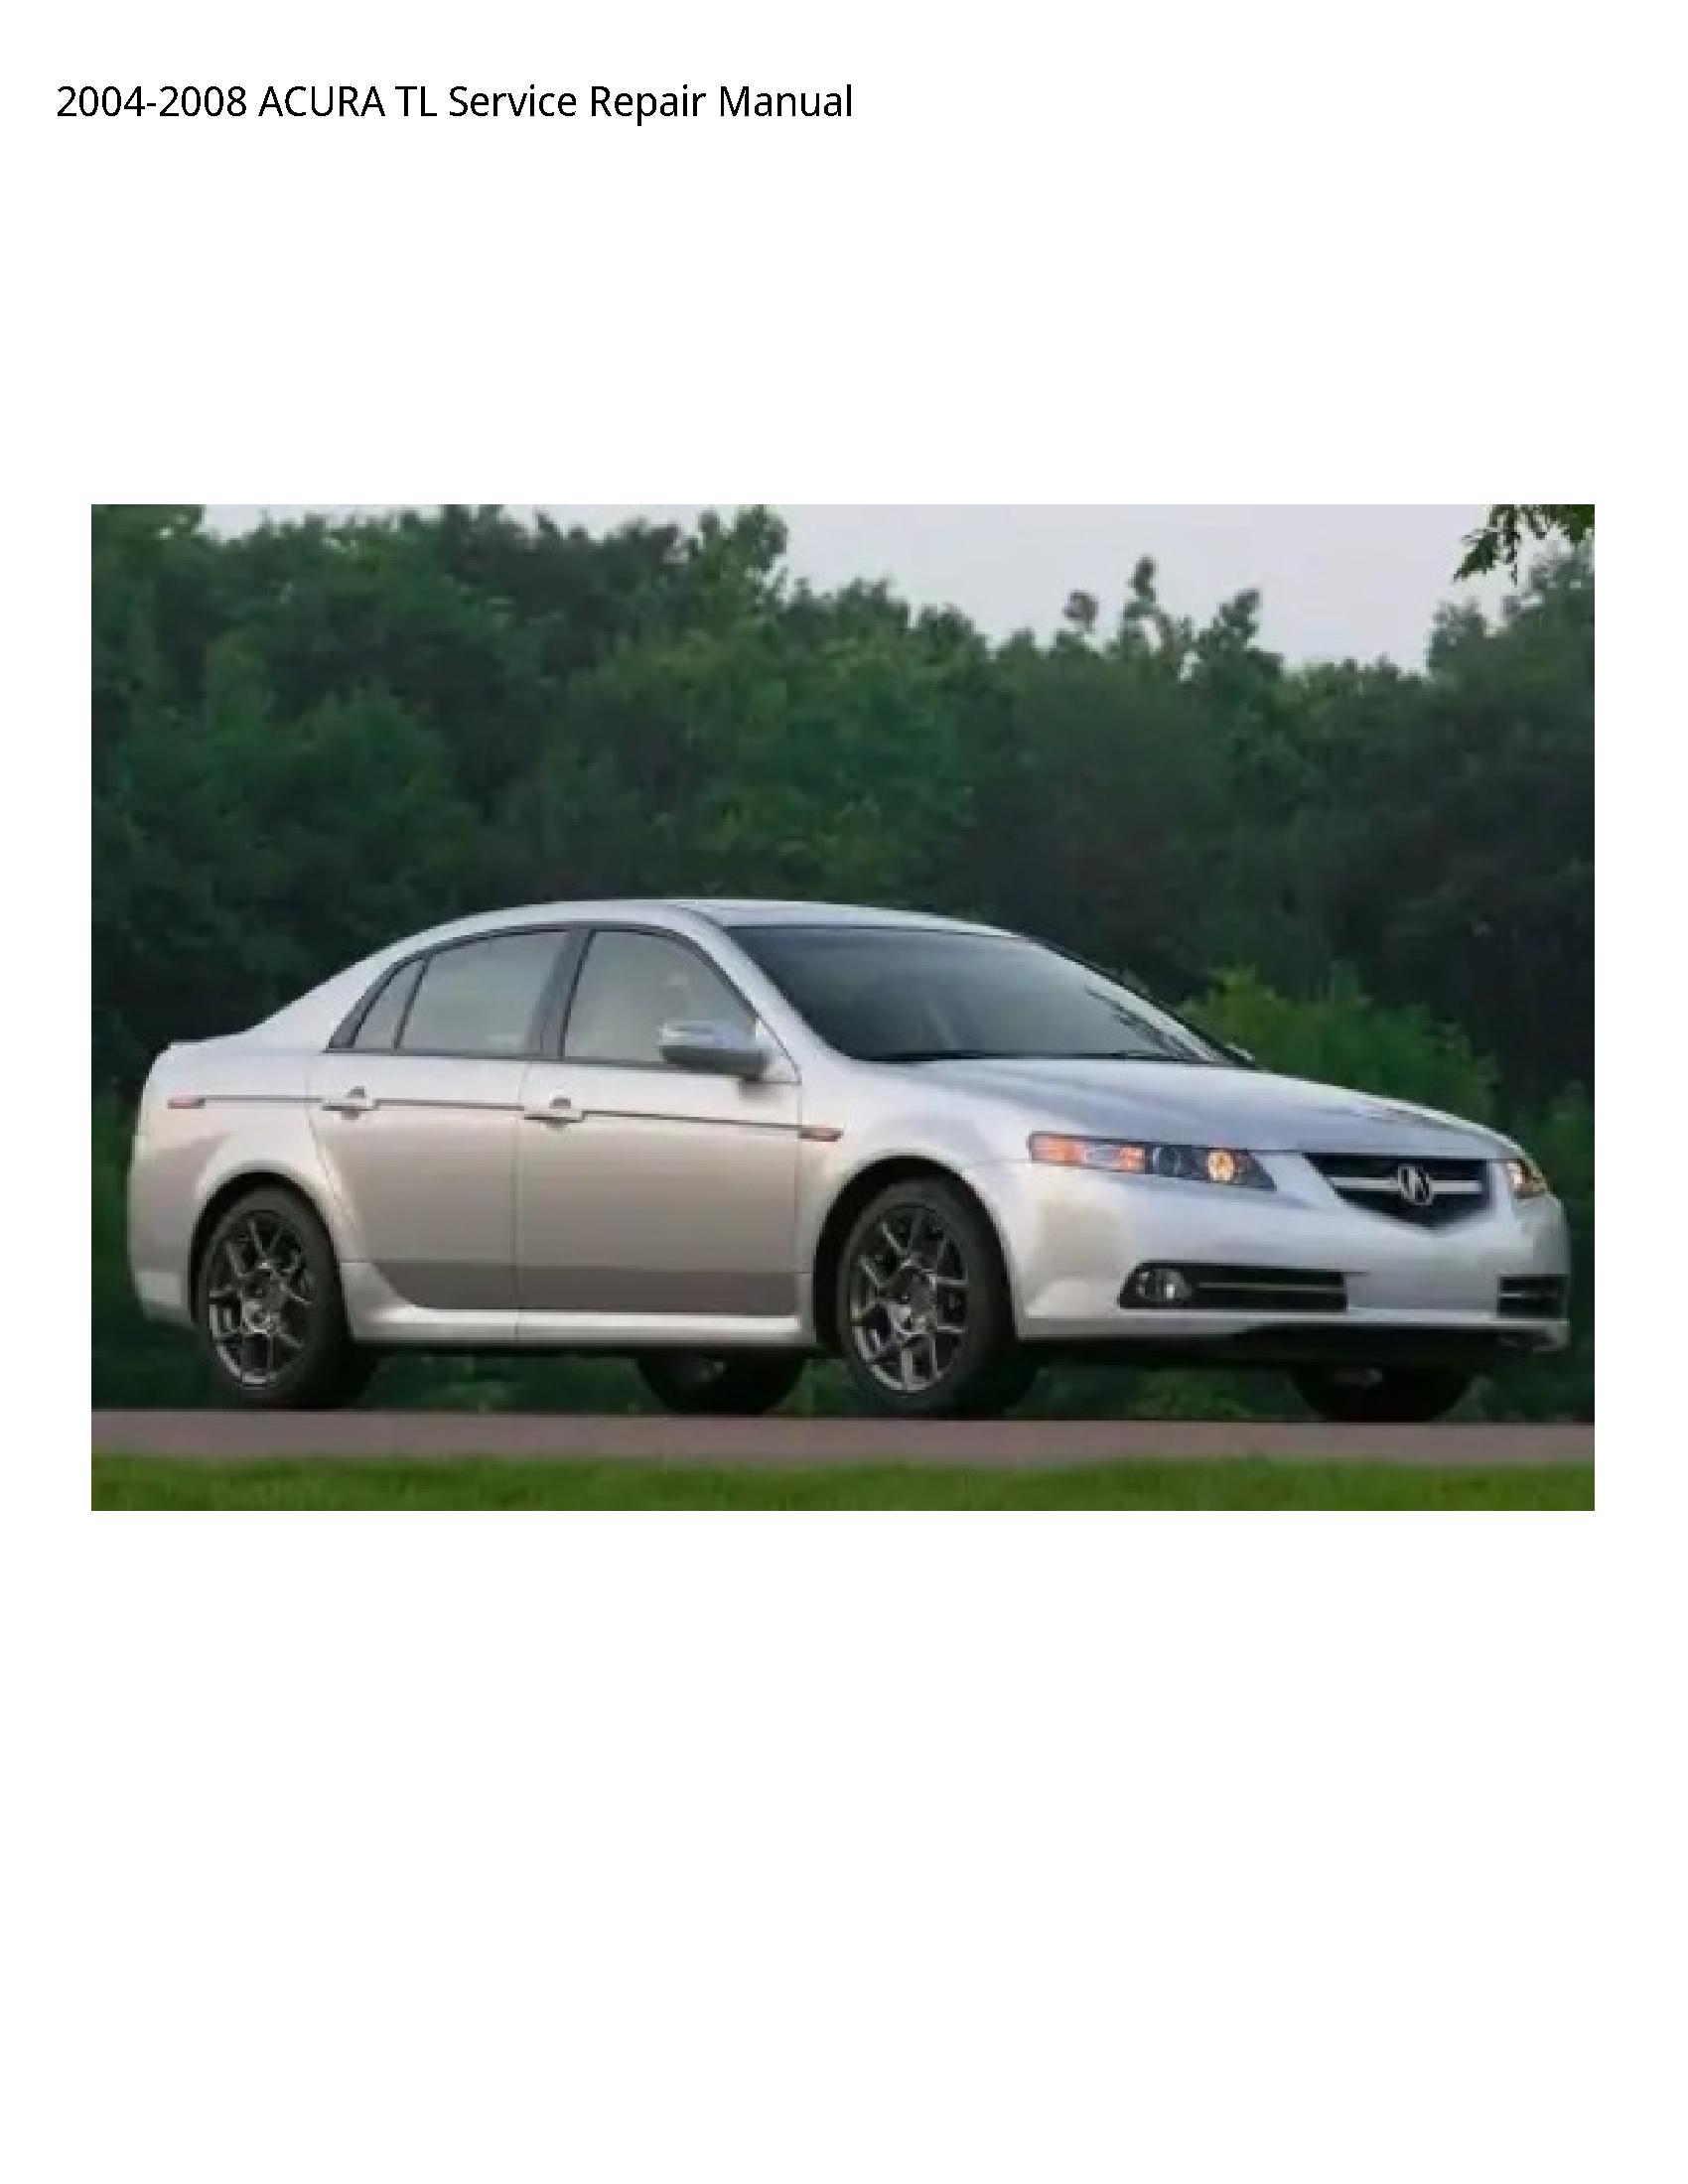 Acura TL manual